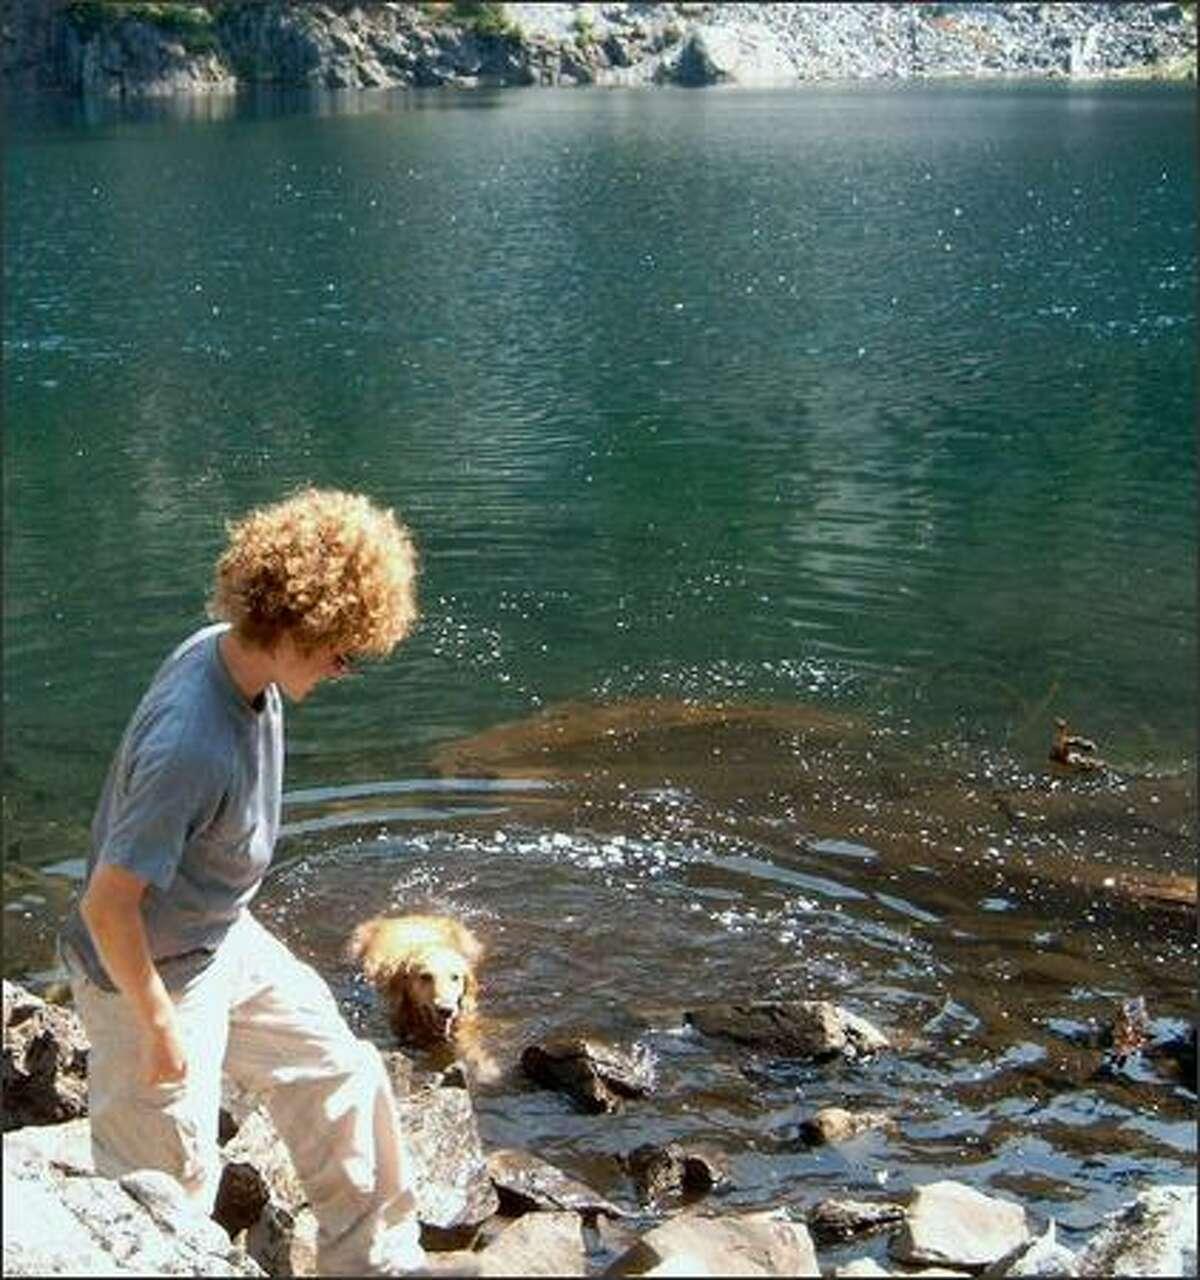 Brent Williams of Issaquah takes a break at Melakwa Lake as his golden retriever, Tika, goes for a refreshing dip.